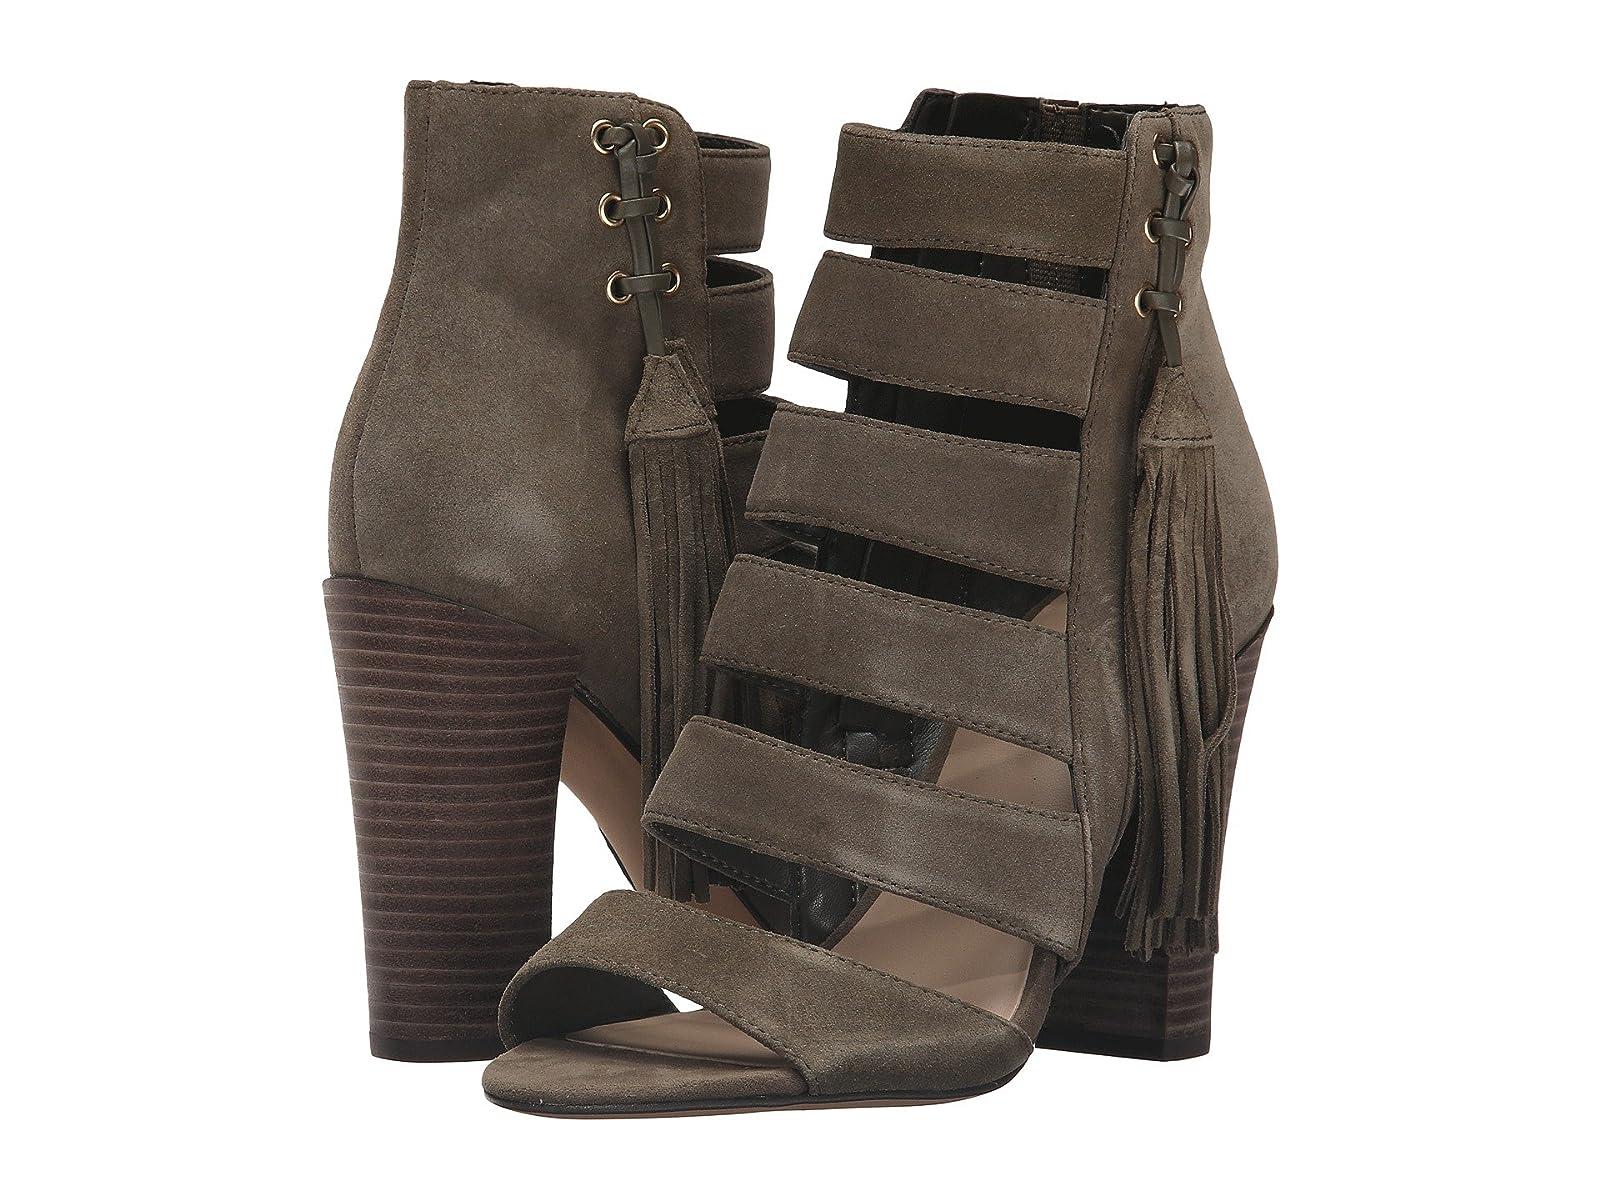 GUESS BlasaCheap and distinctive eye-catching shoes